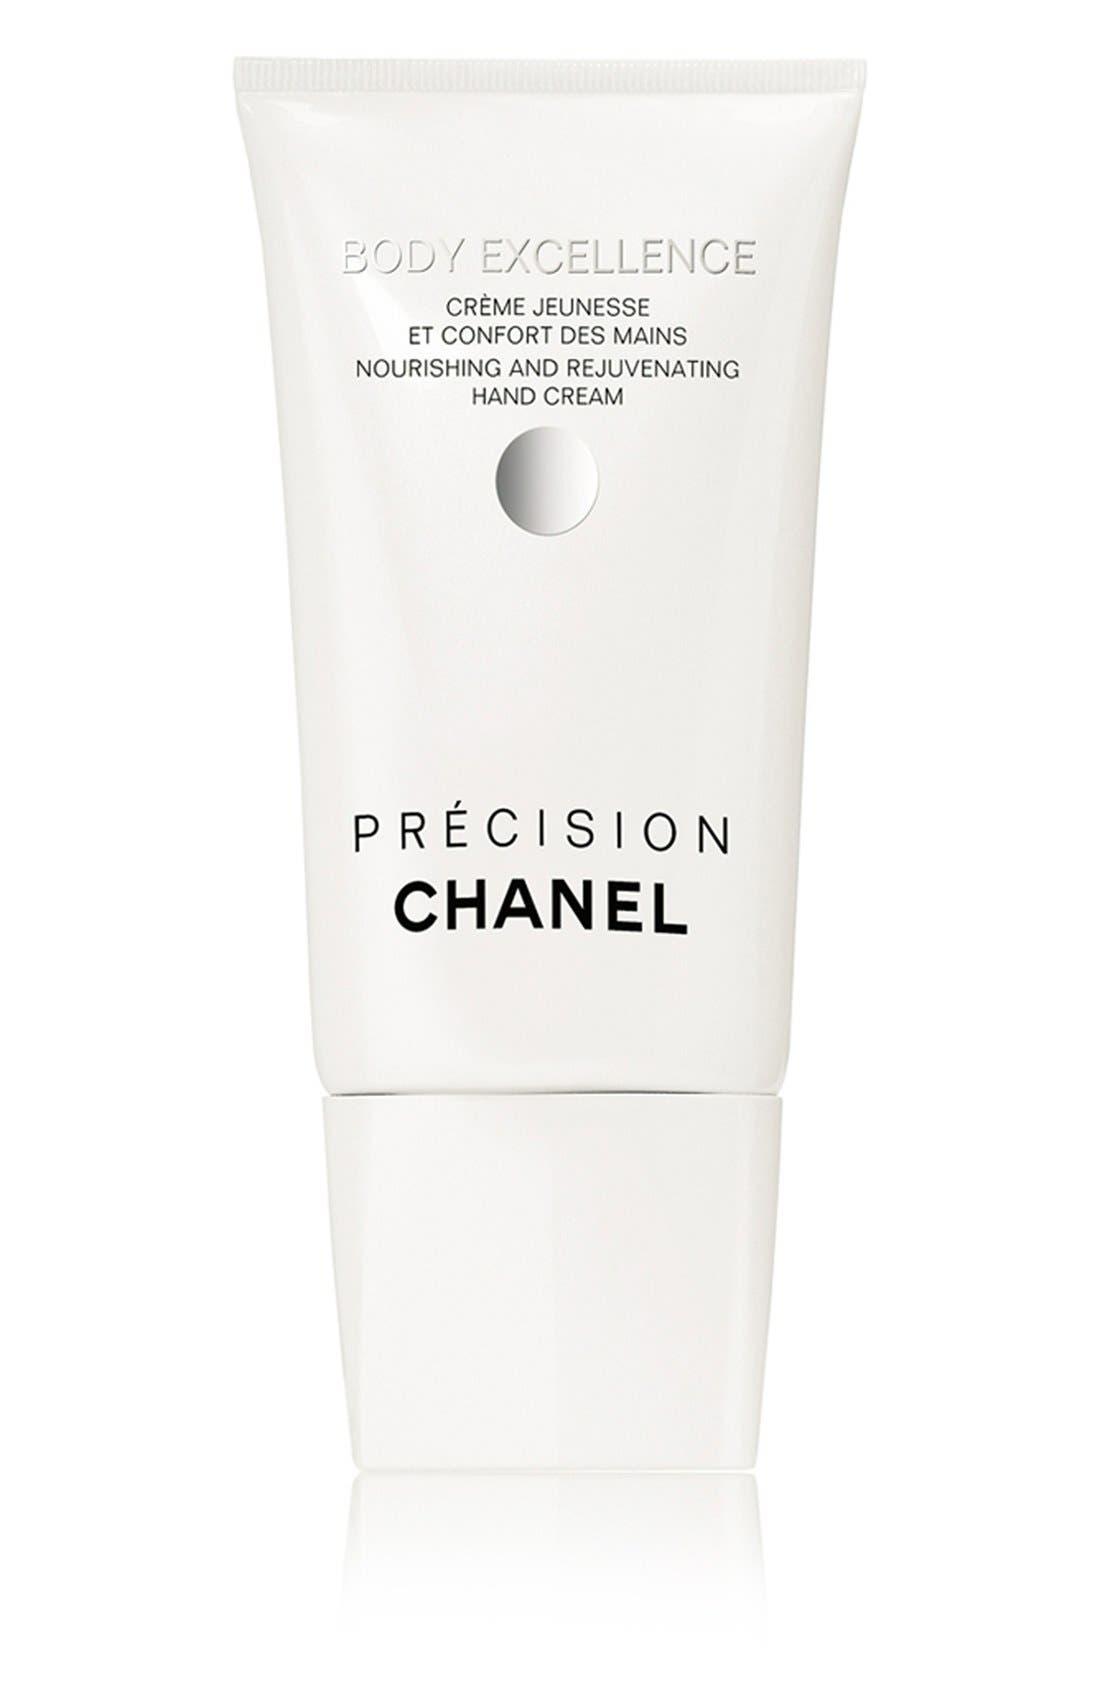 CHANEL BODY EXCELLENCE  Nourishing & Rejuvenating Hand Cream